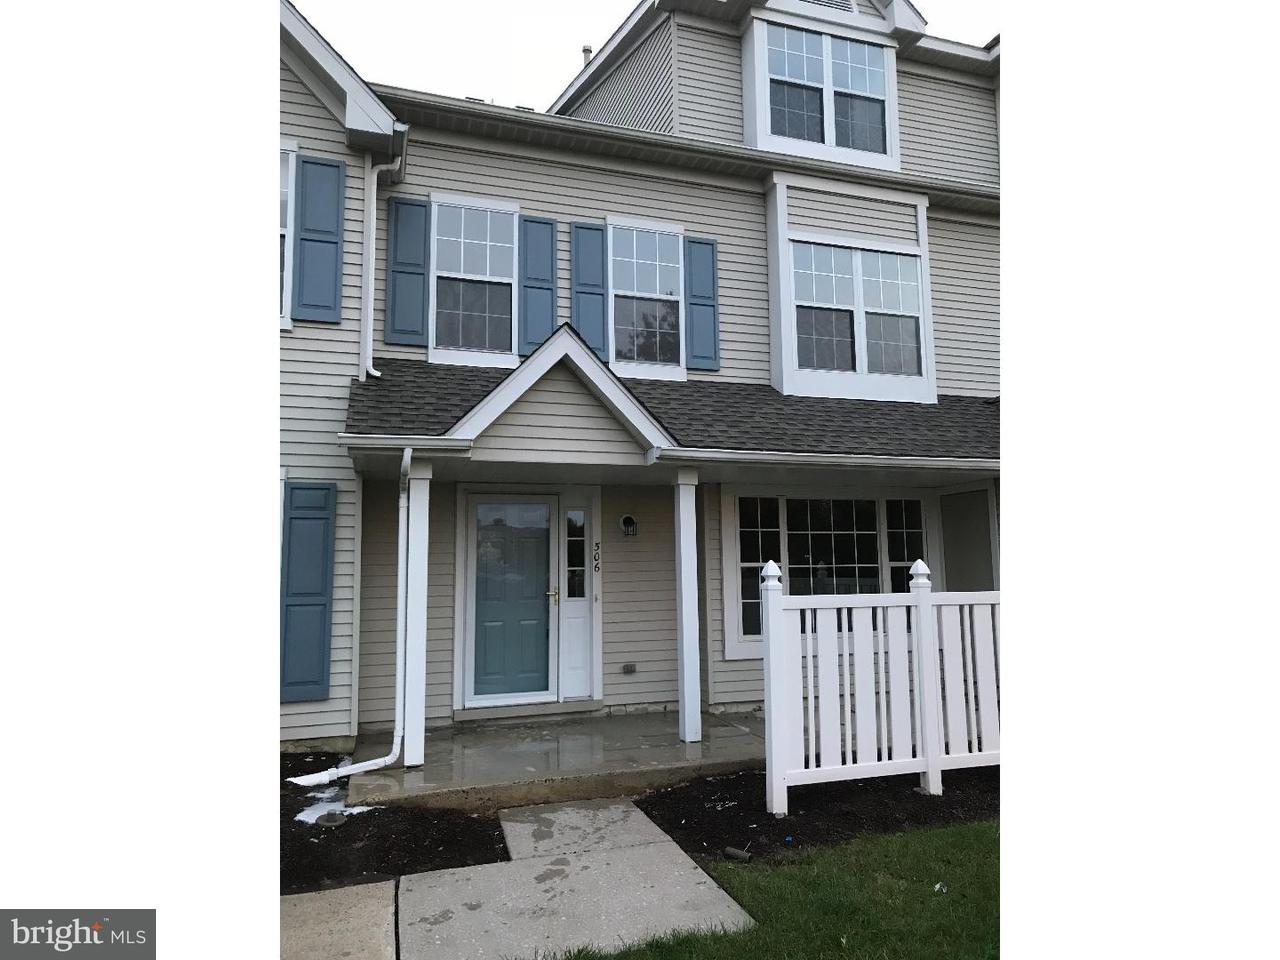 Condominium for Sale at 506 OLIPHANT Lane Mount Laurel, New Jersey 08054 United States